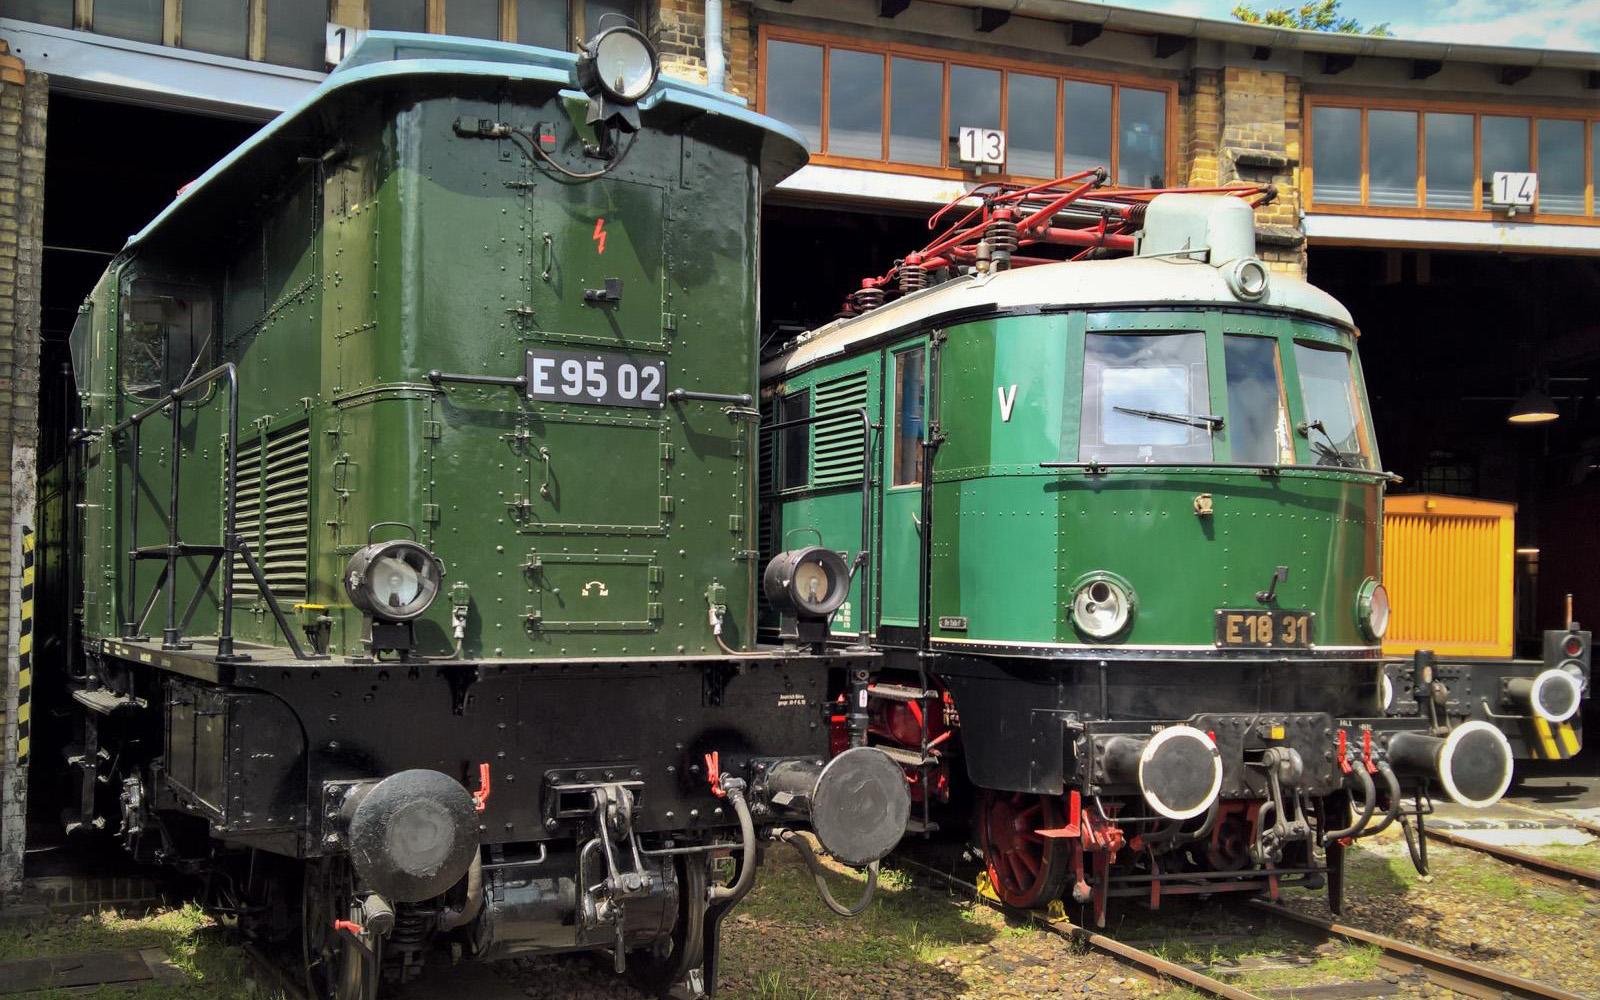 ©Foto: Christian Wodzinski | railmen | Güterzuglokomotive E95 02 im DB Museum Halle | BJ 1927